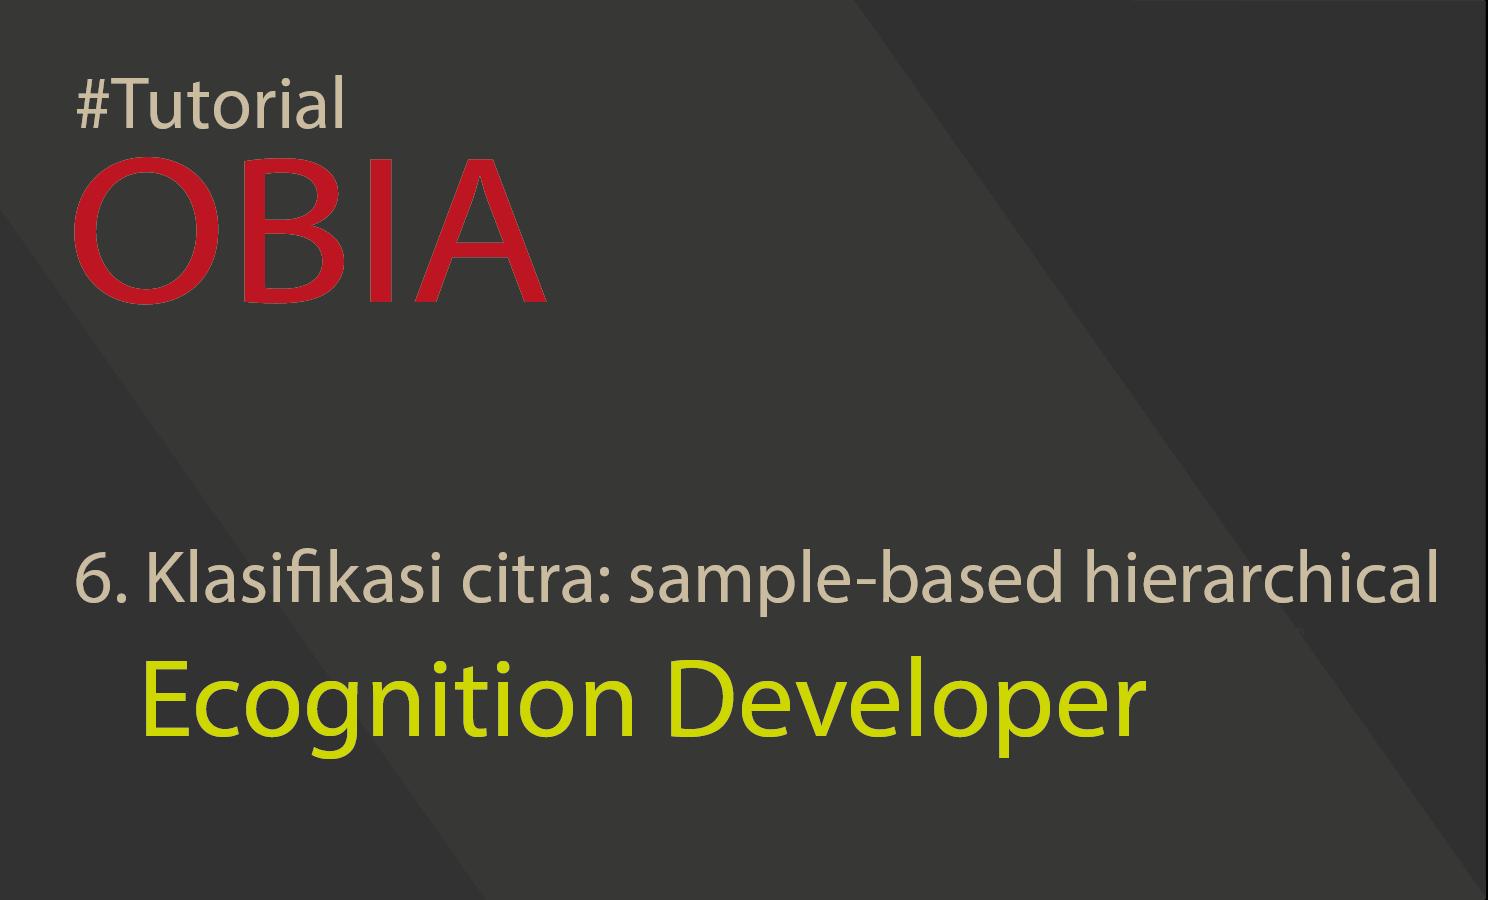 klasifikasi sampel hirarki obia ecognition